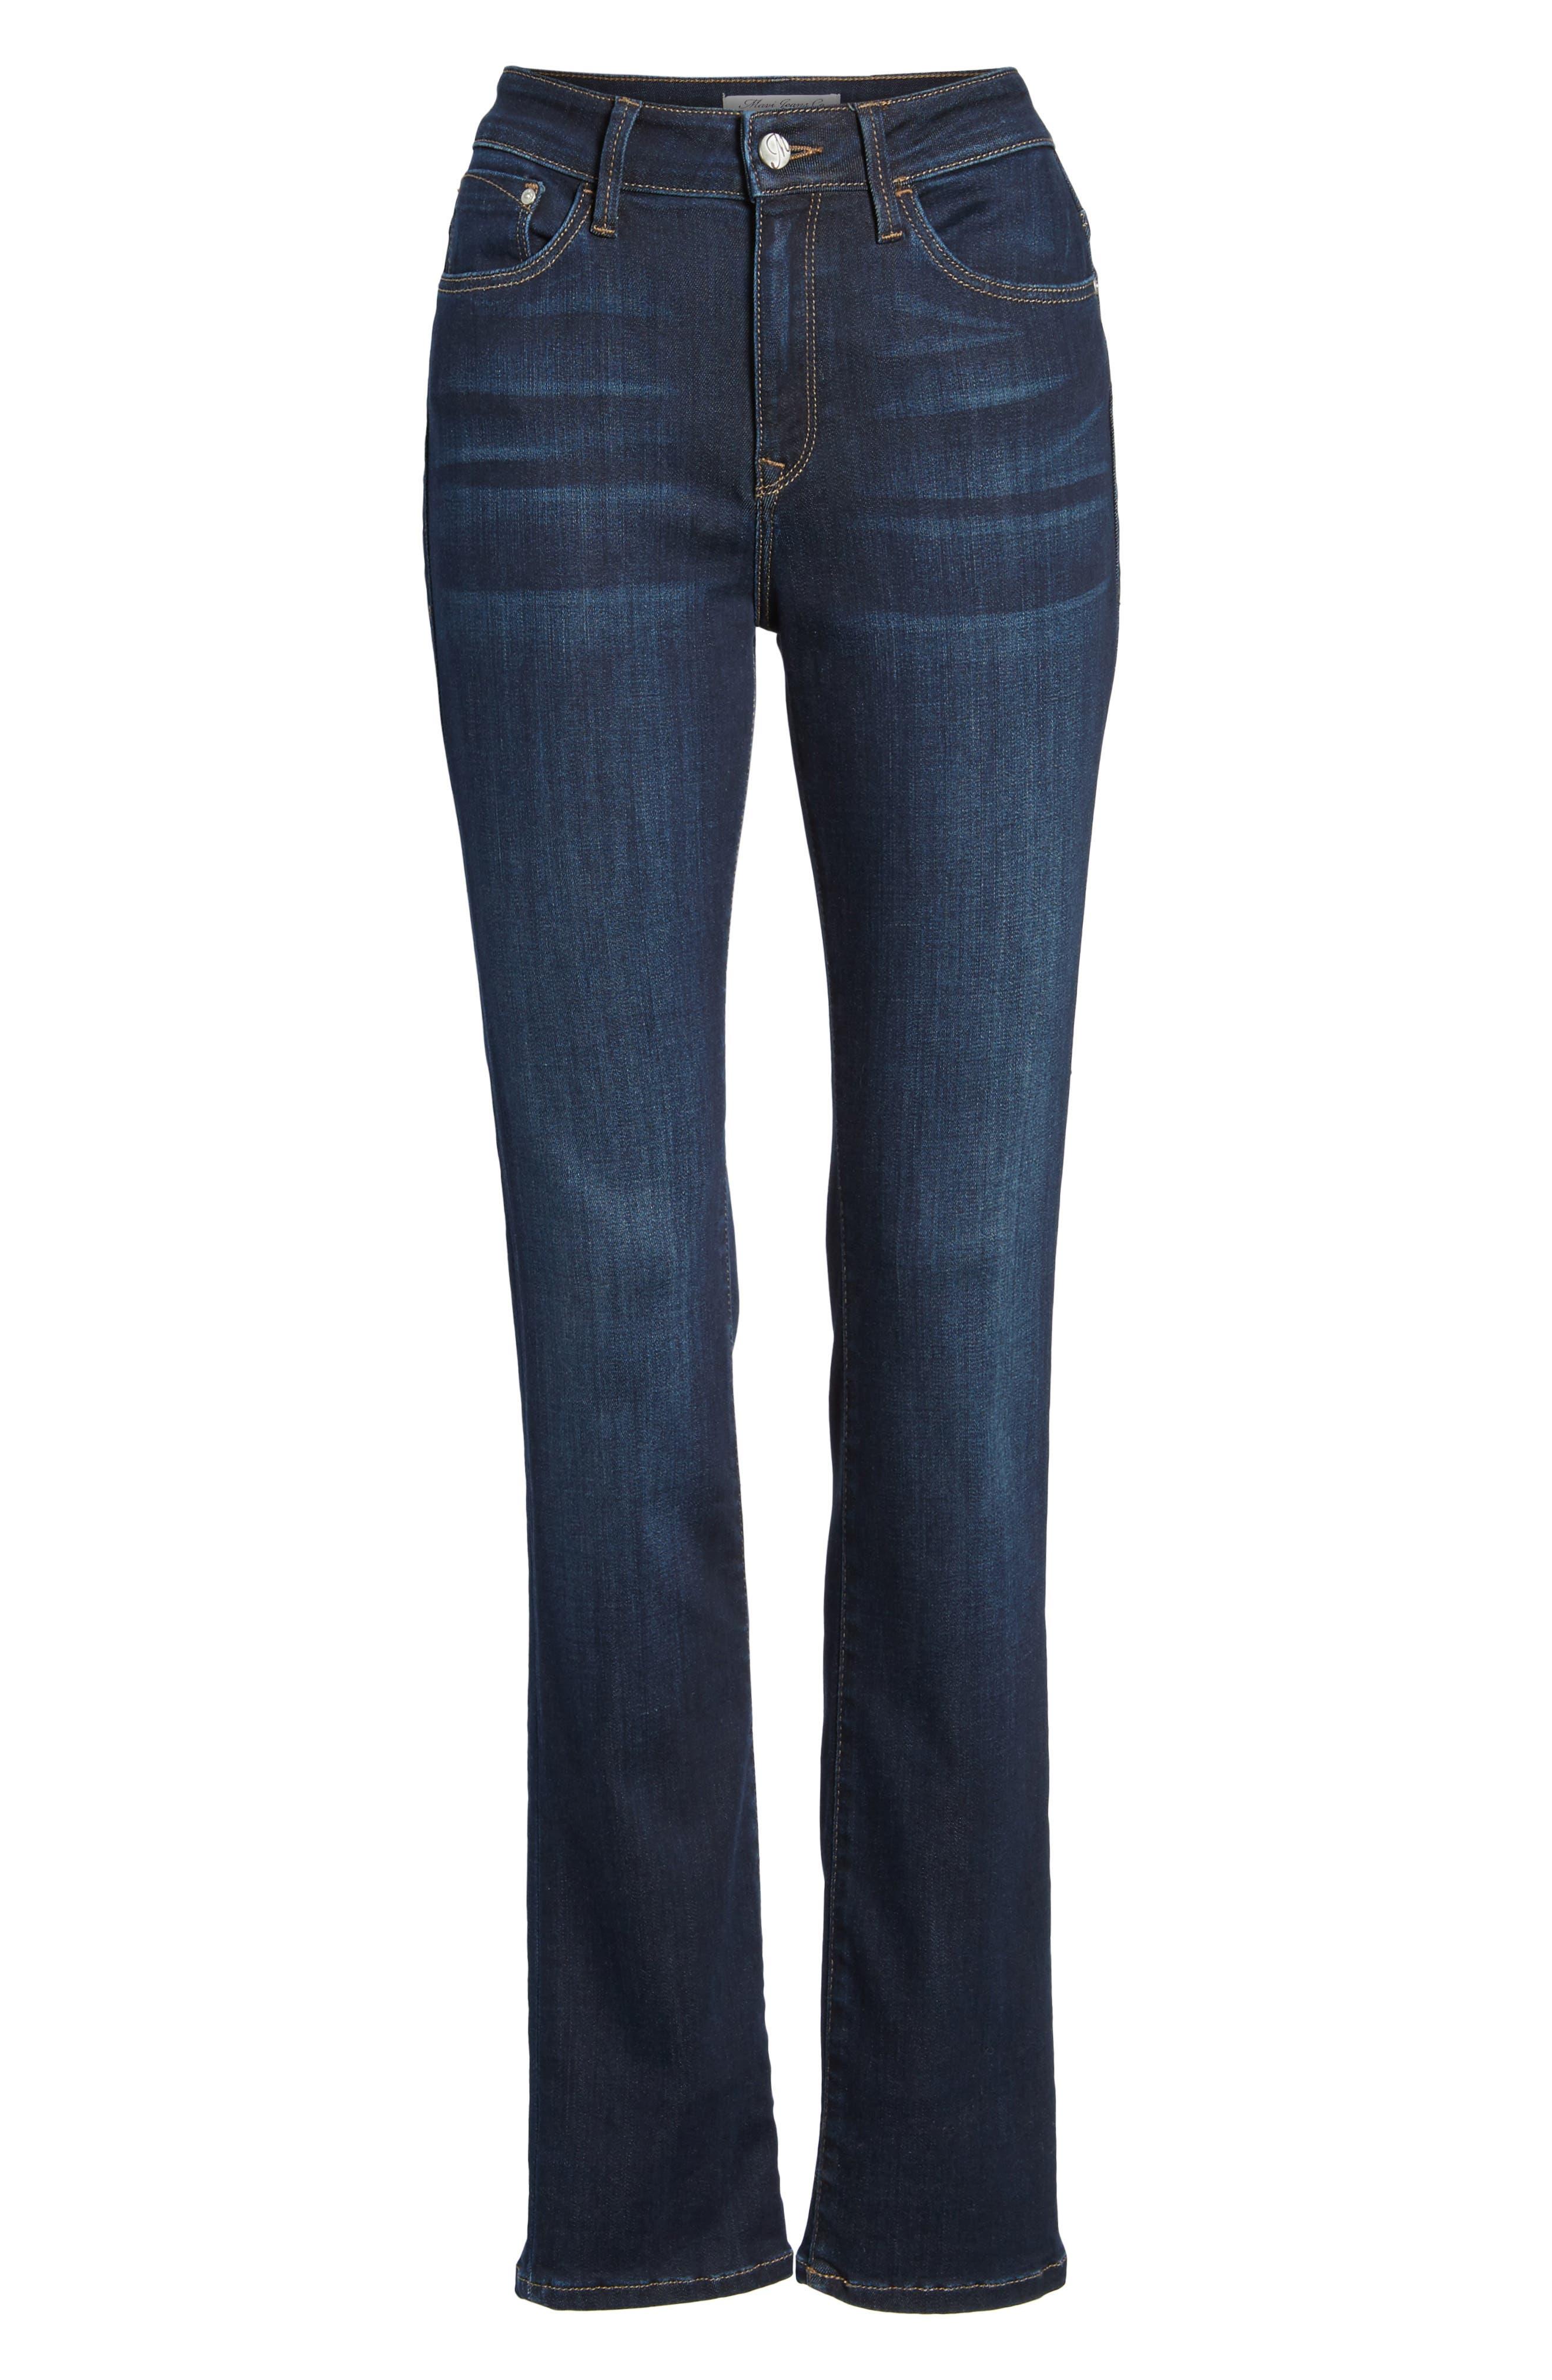 Kendra Straight Leg Jeans,                             Alternate thumbnail 7, color,                             Deep Supersoft